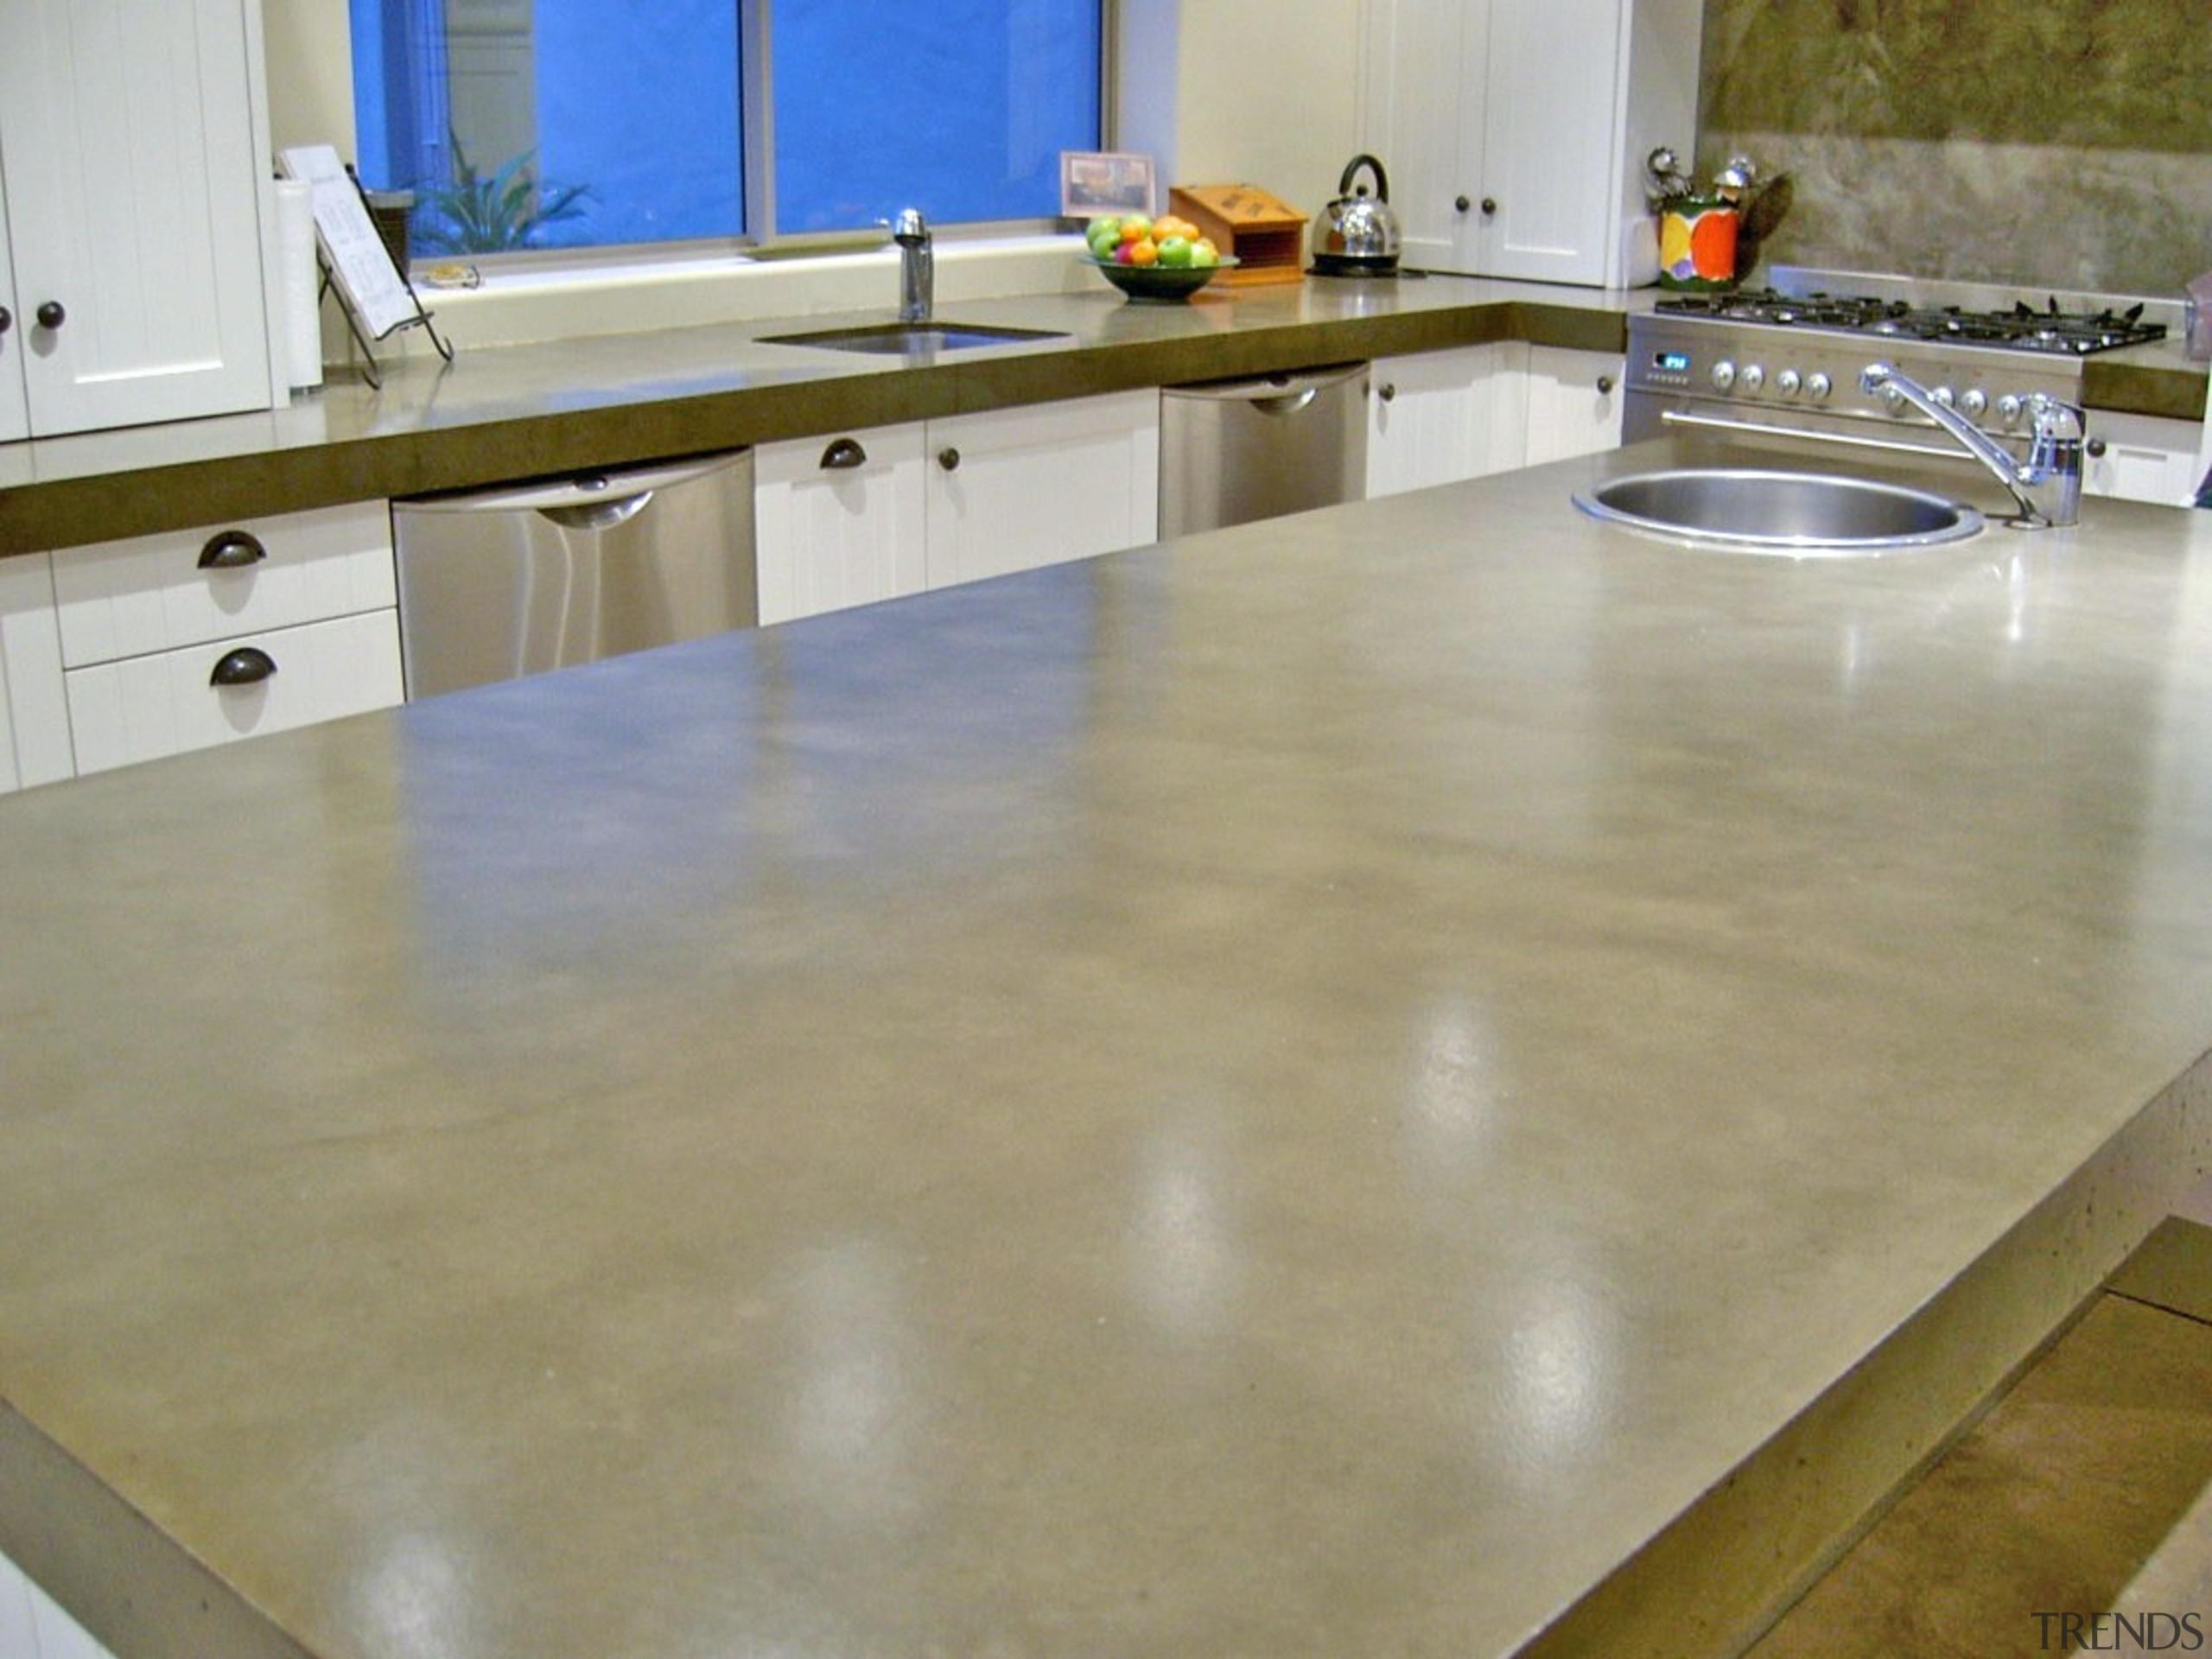 Colourmix 47 - Colourmix_47 - countertop | floor countertop, floor, flooring, hardwood, kitchen, material, orange, brown